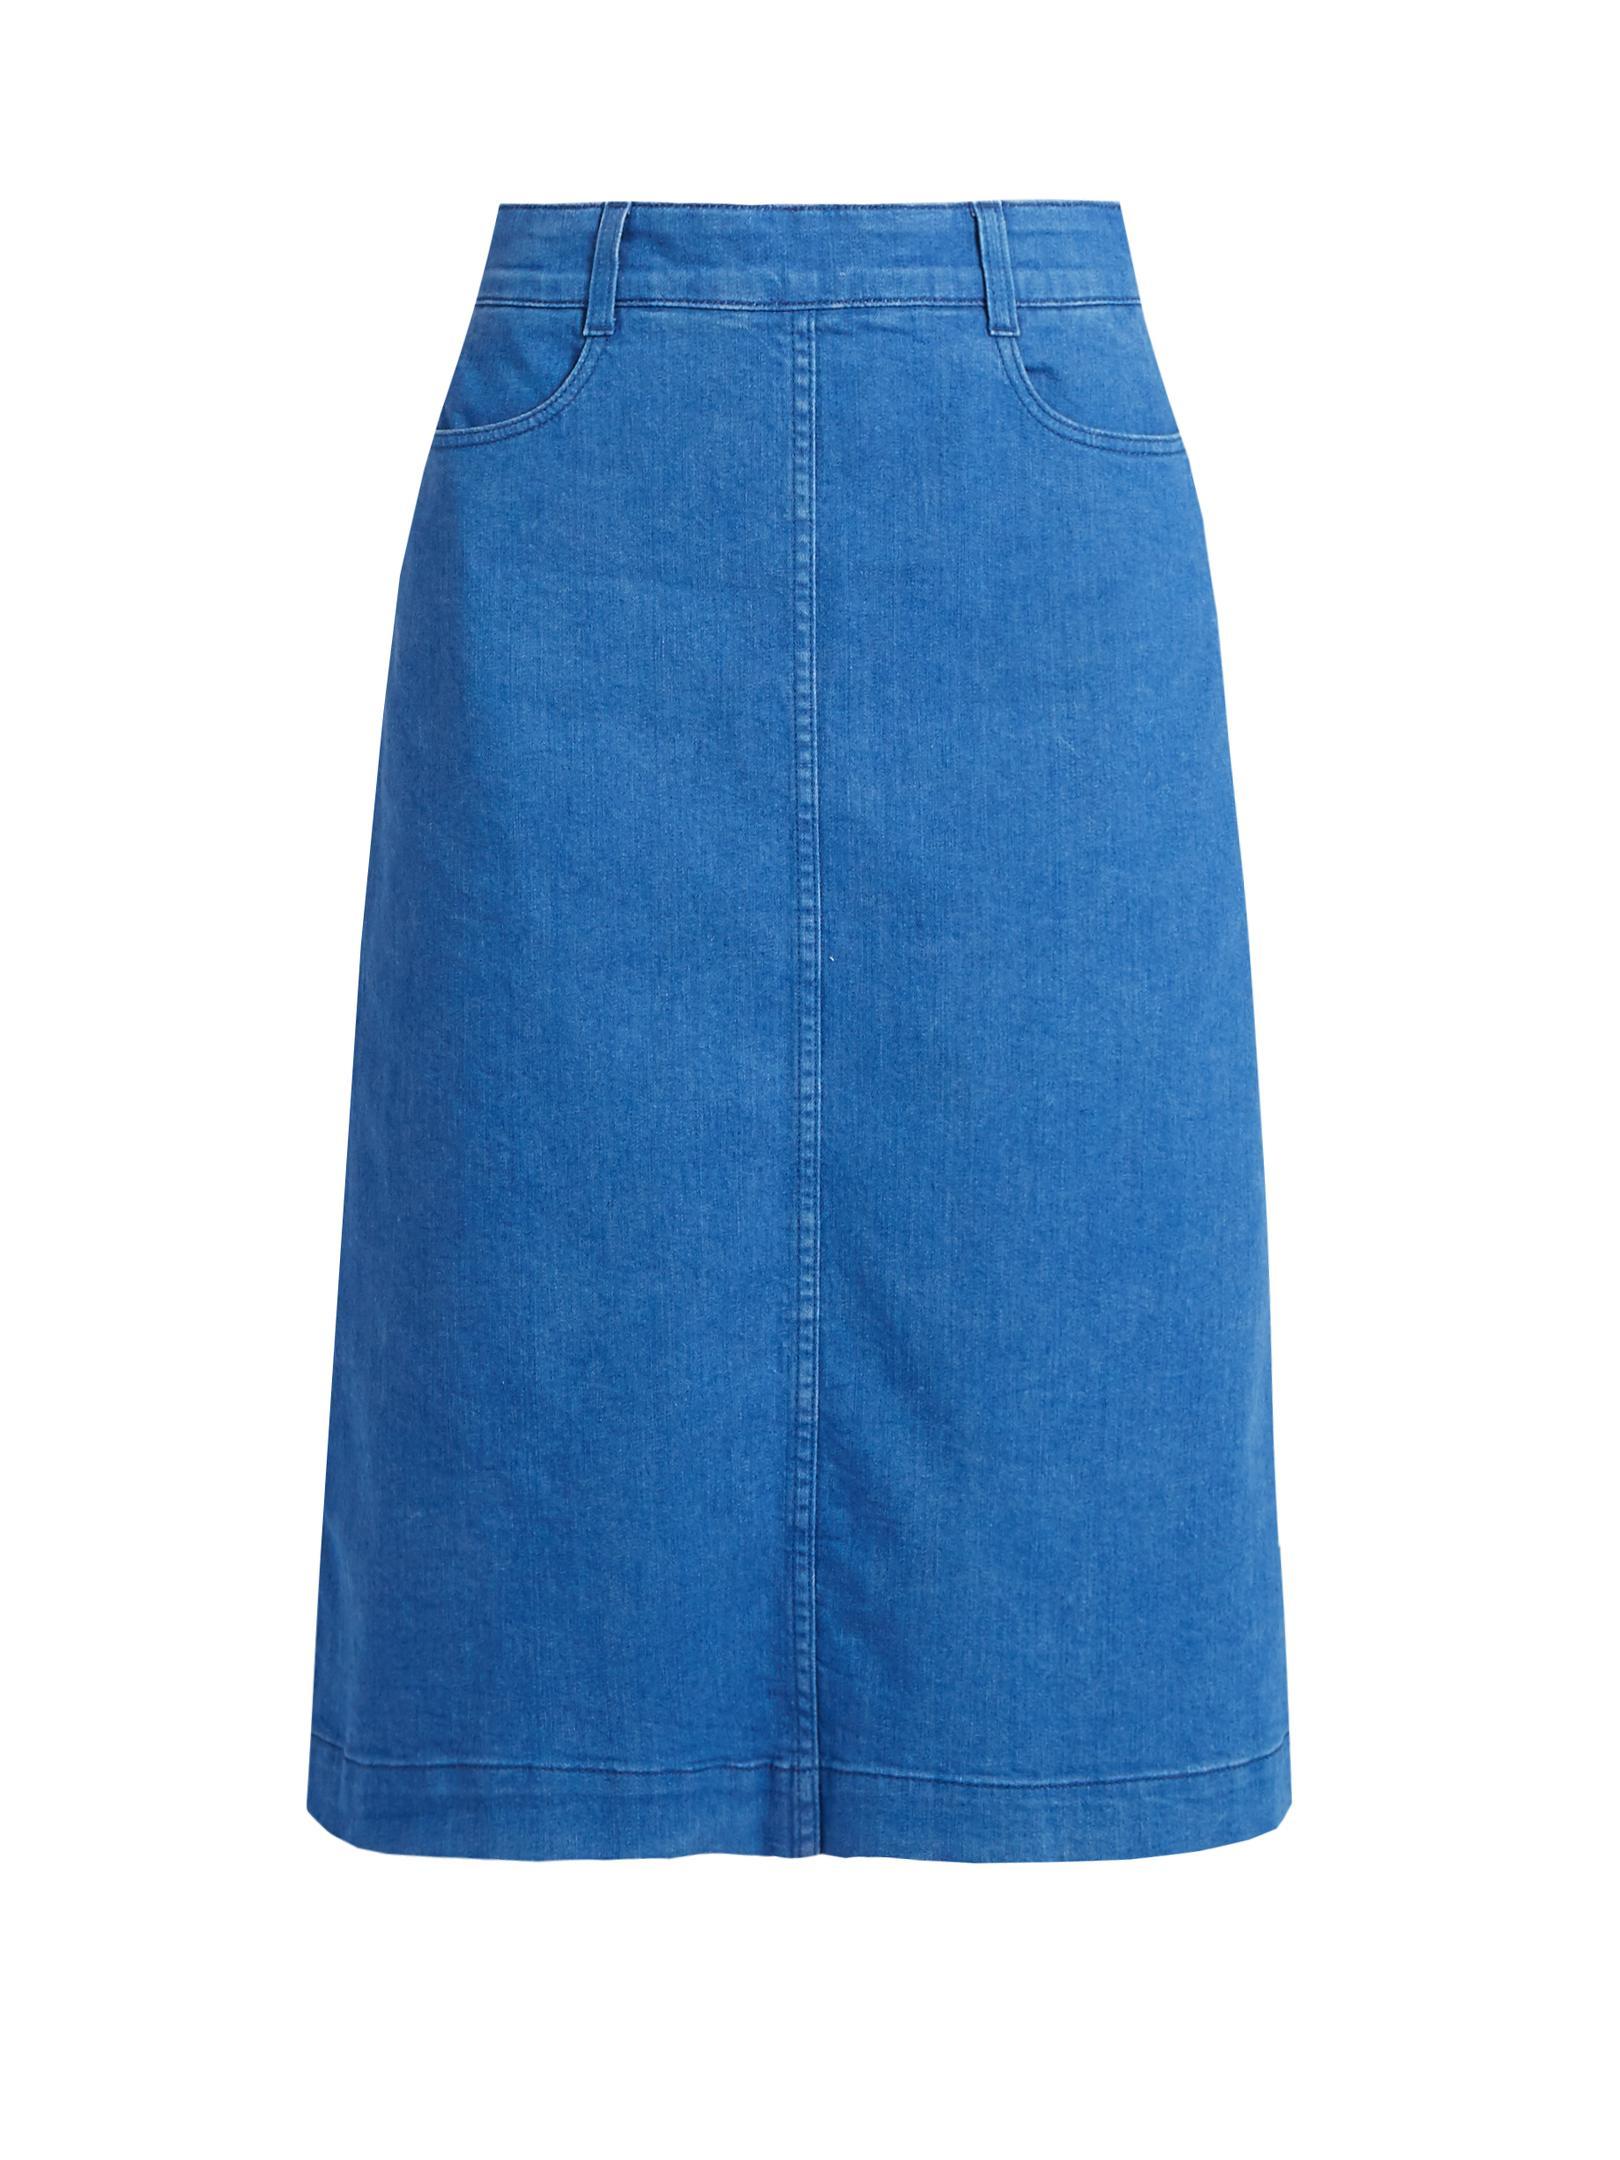 stella mccartney high rise denim midi skirt in blue lyst